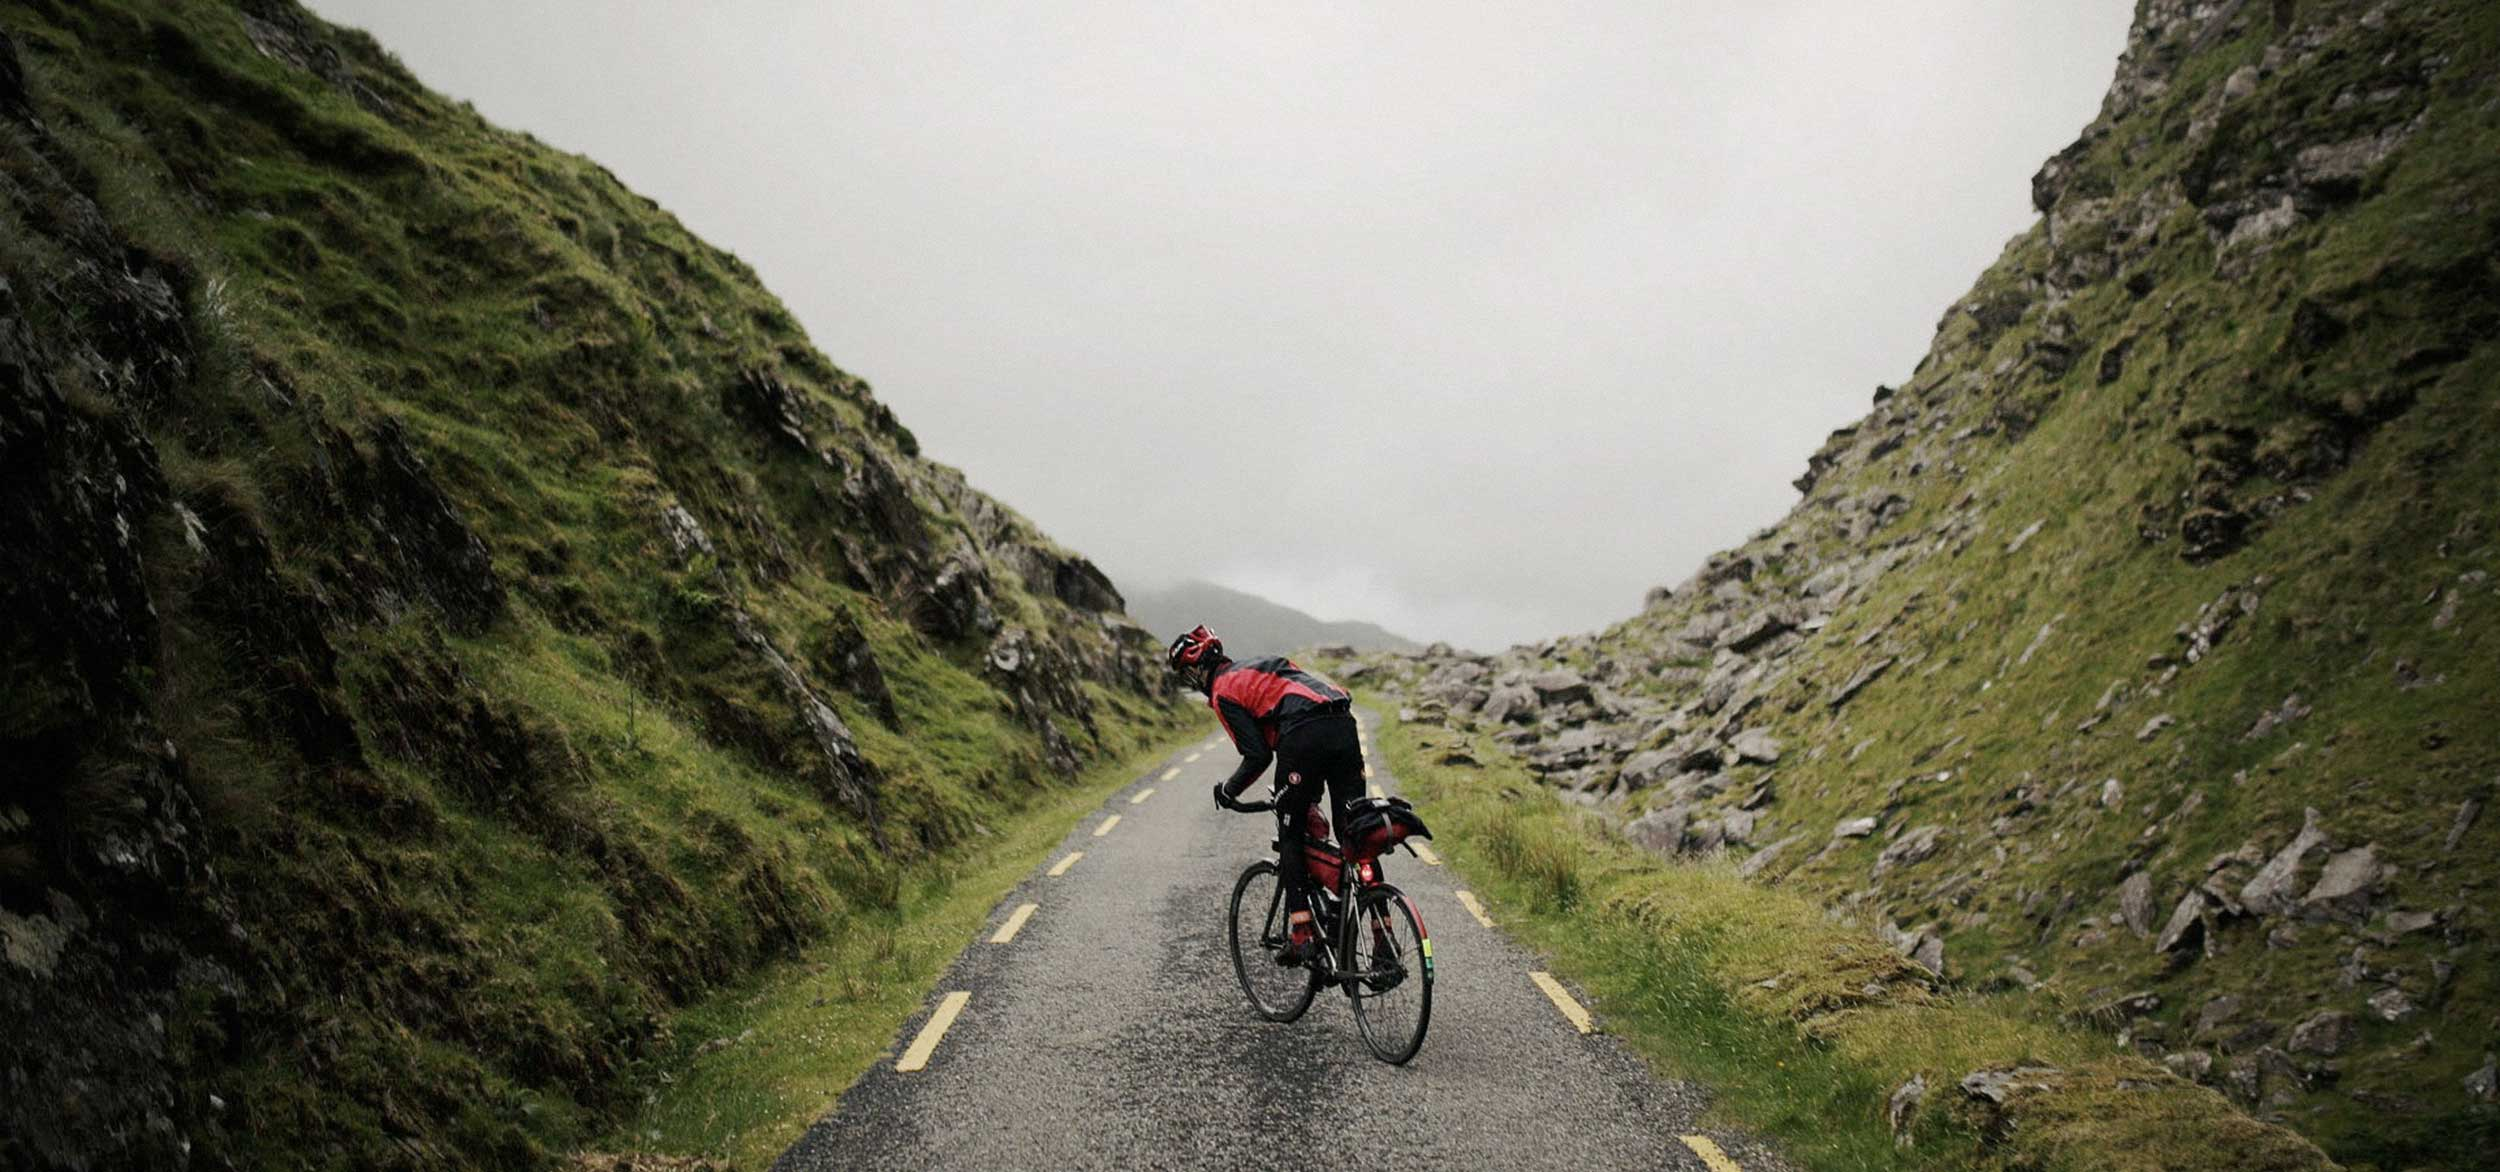 transatlantic way race cyclist